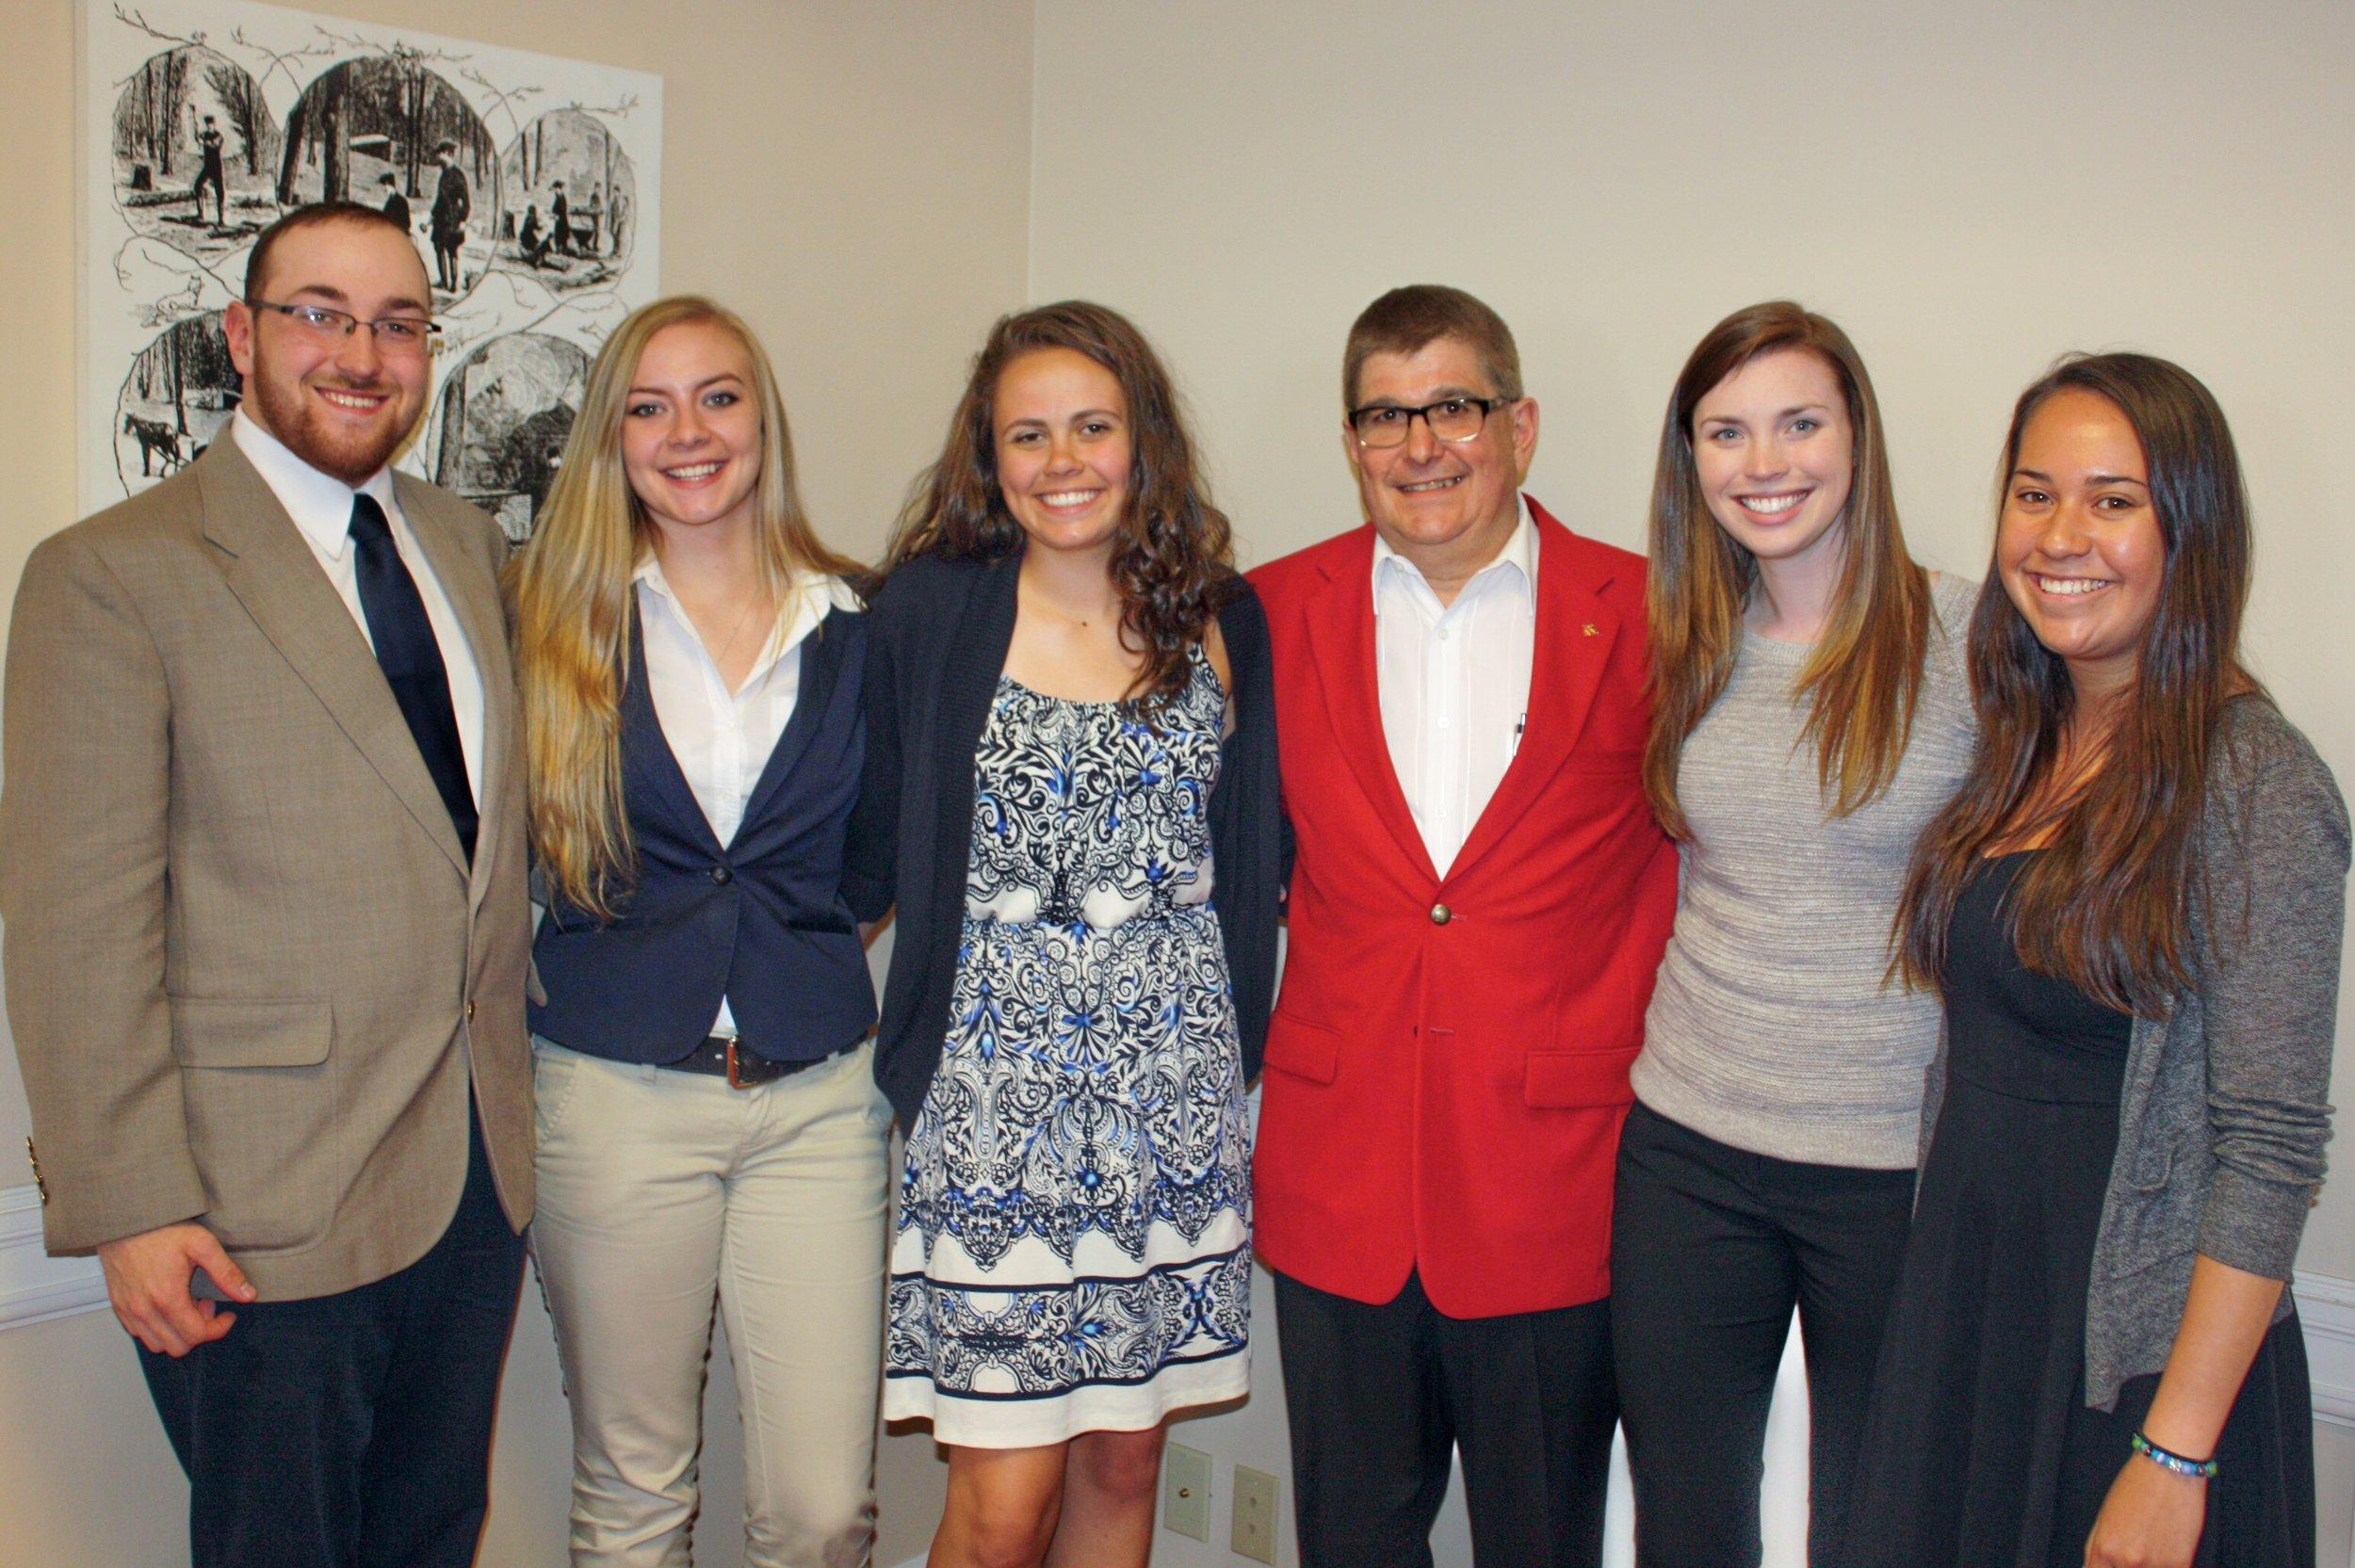 Past Recipients L-R Christopher Harloff, Ellen Vibbard, Christina Noto Rich McCaffery, Sarah Dewey and Kayla Haggerty